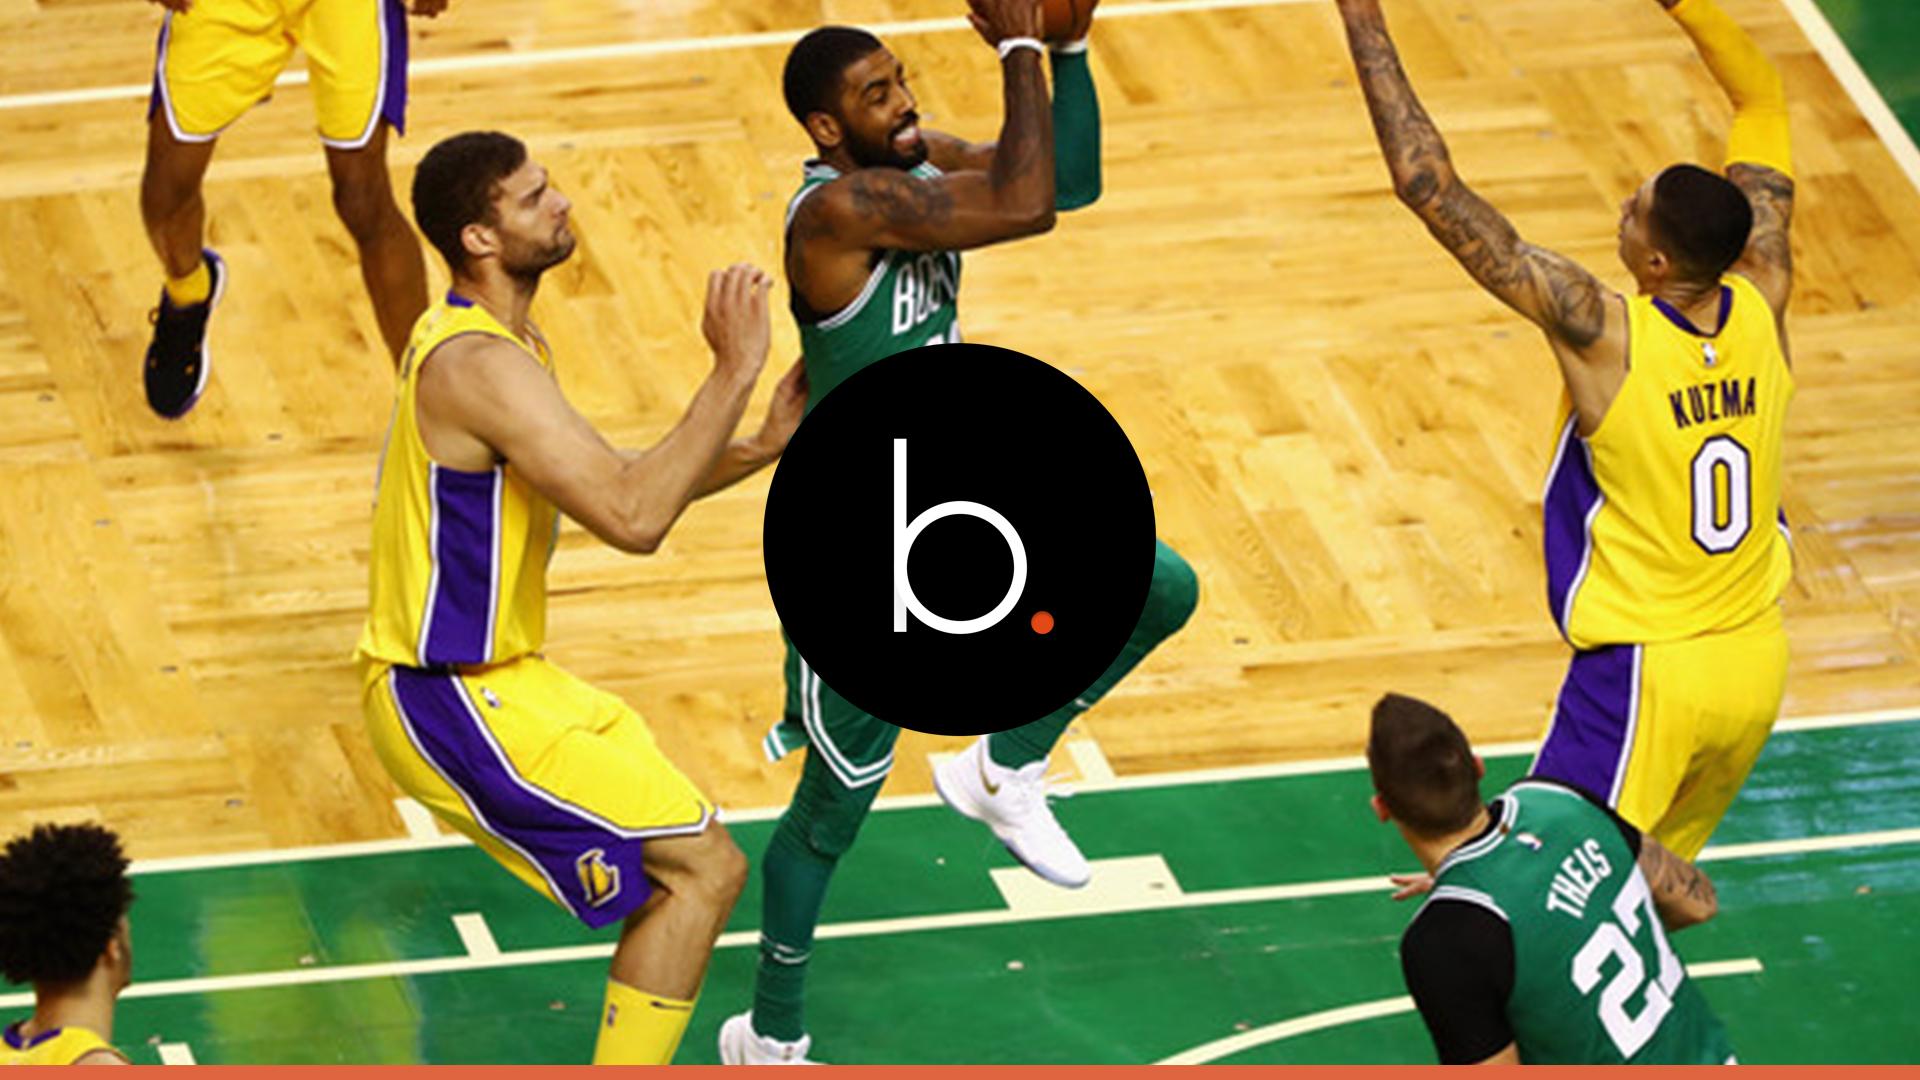 Celtics defeat Lakers 107-96, extending their winning streak to 10 games